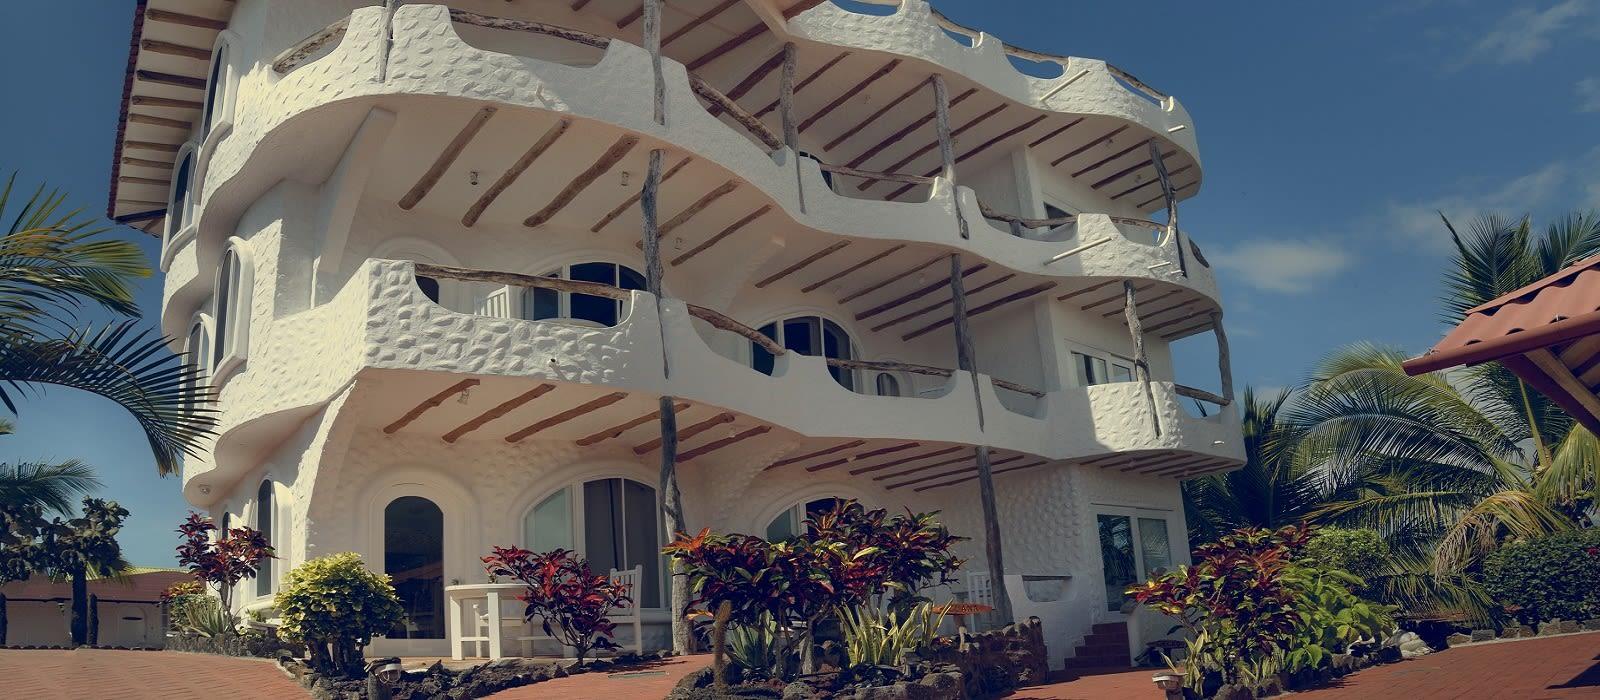 Hotel Angermeyer Waterfront Inn Ecuador/Galapagos